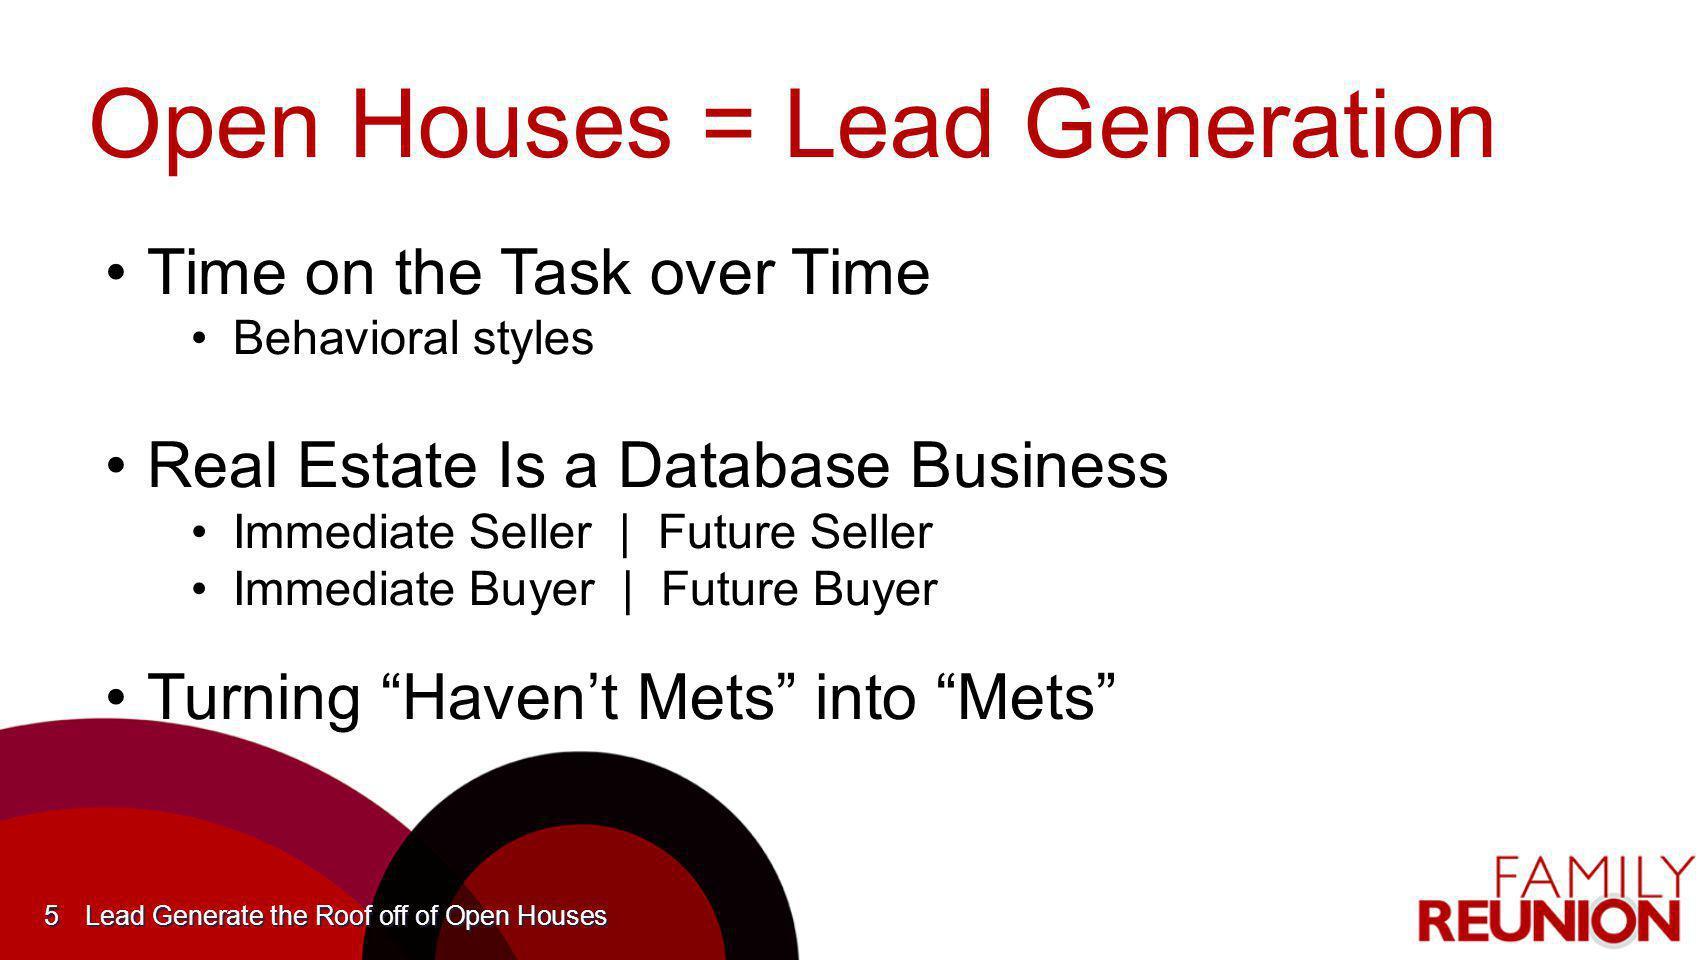 Open Houses = Lead Generation